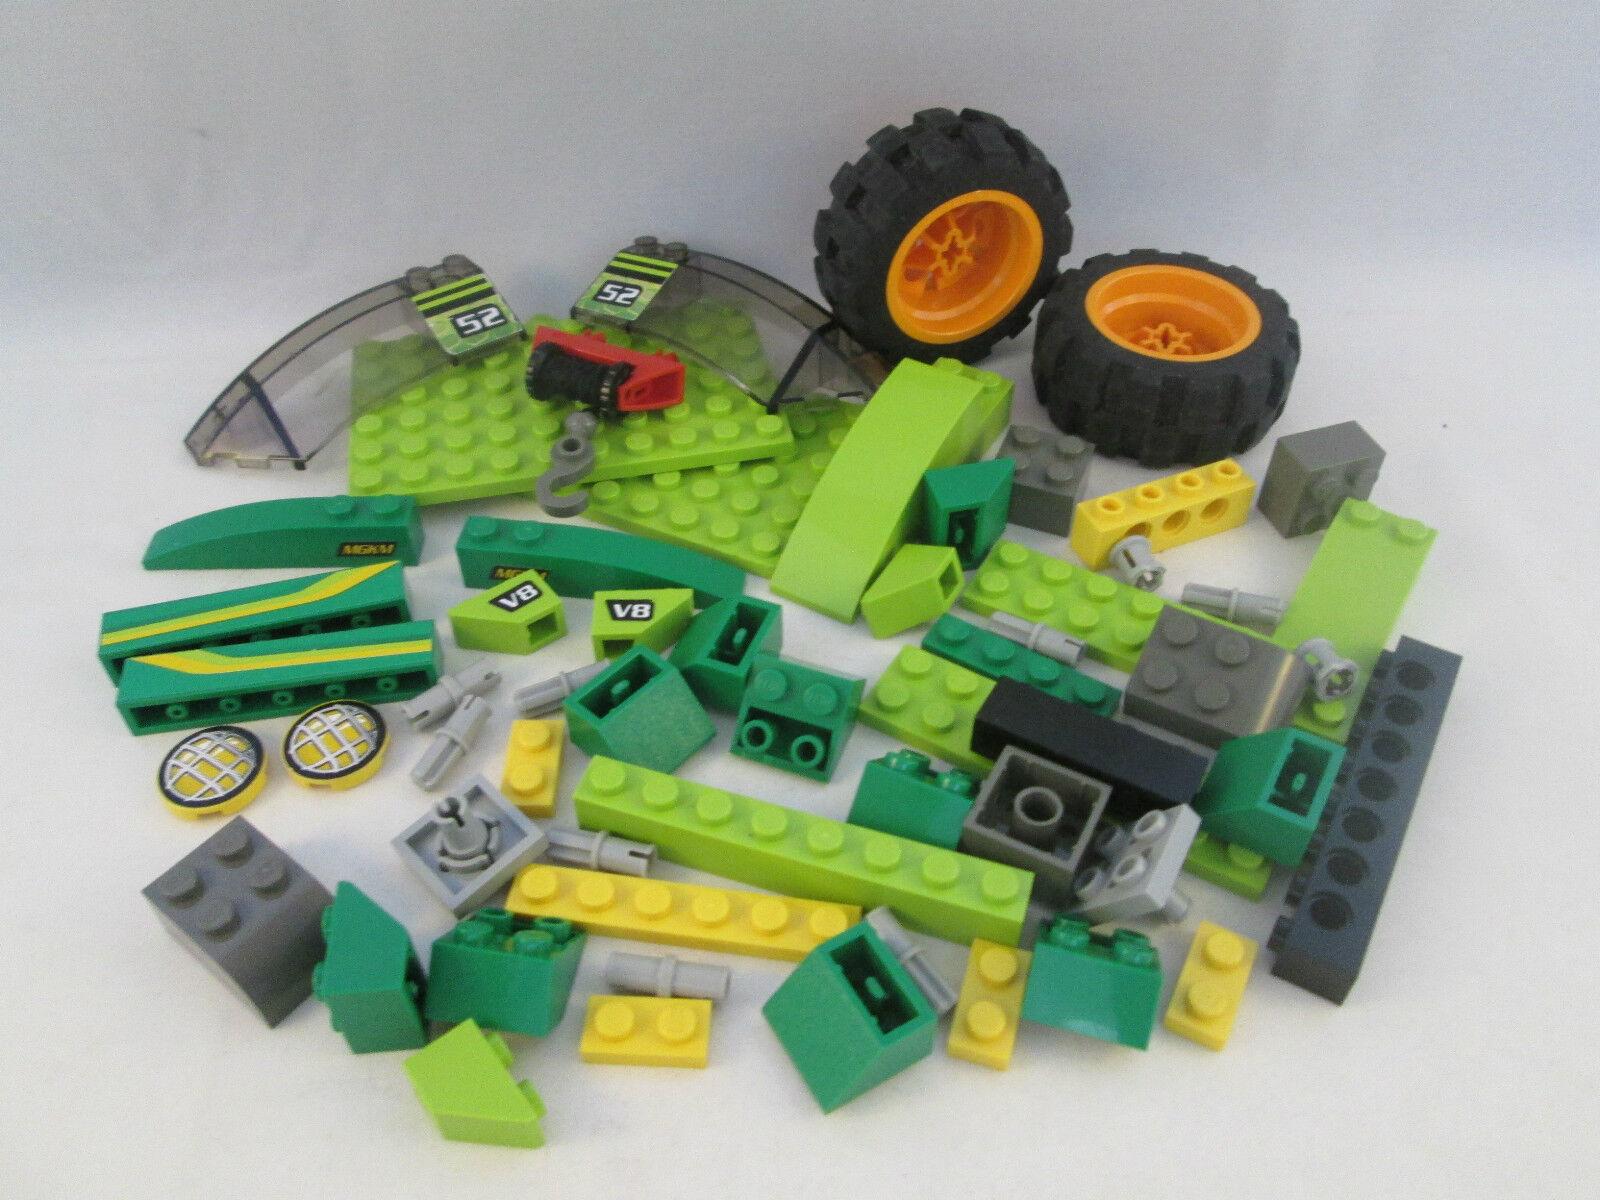 Lego Racers - 4589 4589 4589 RC Nitro Flash - Radio Control Infra rot a5de59